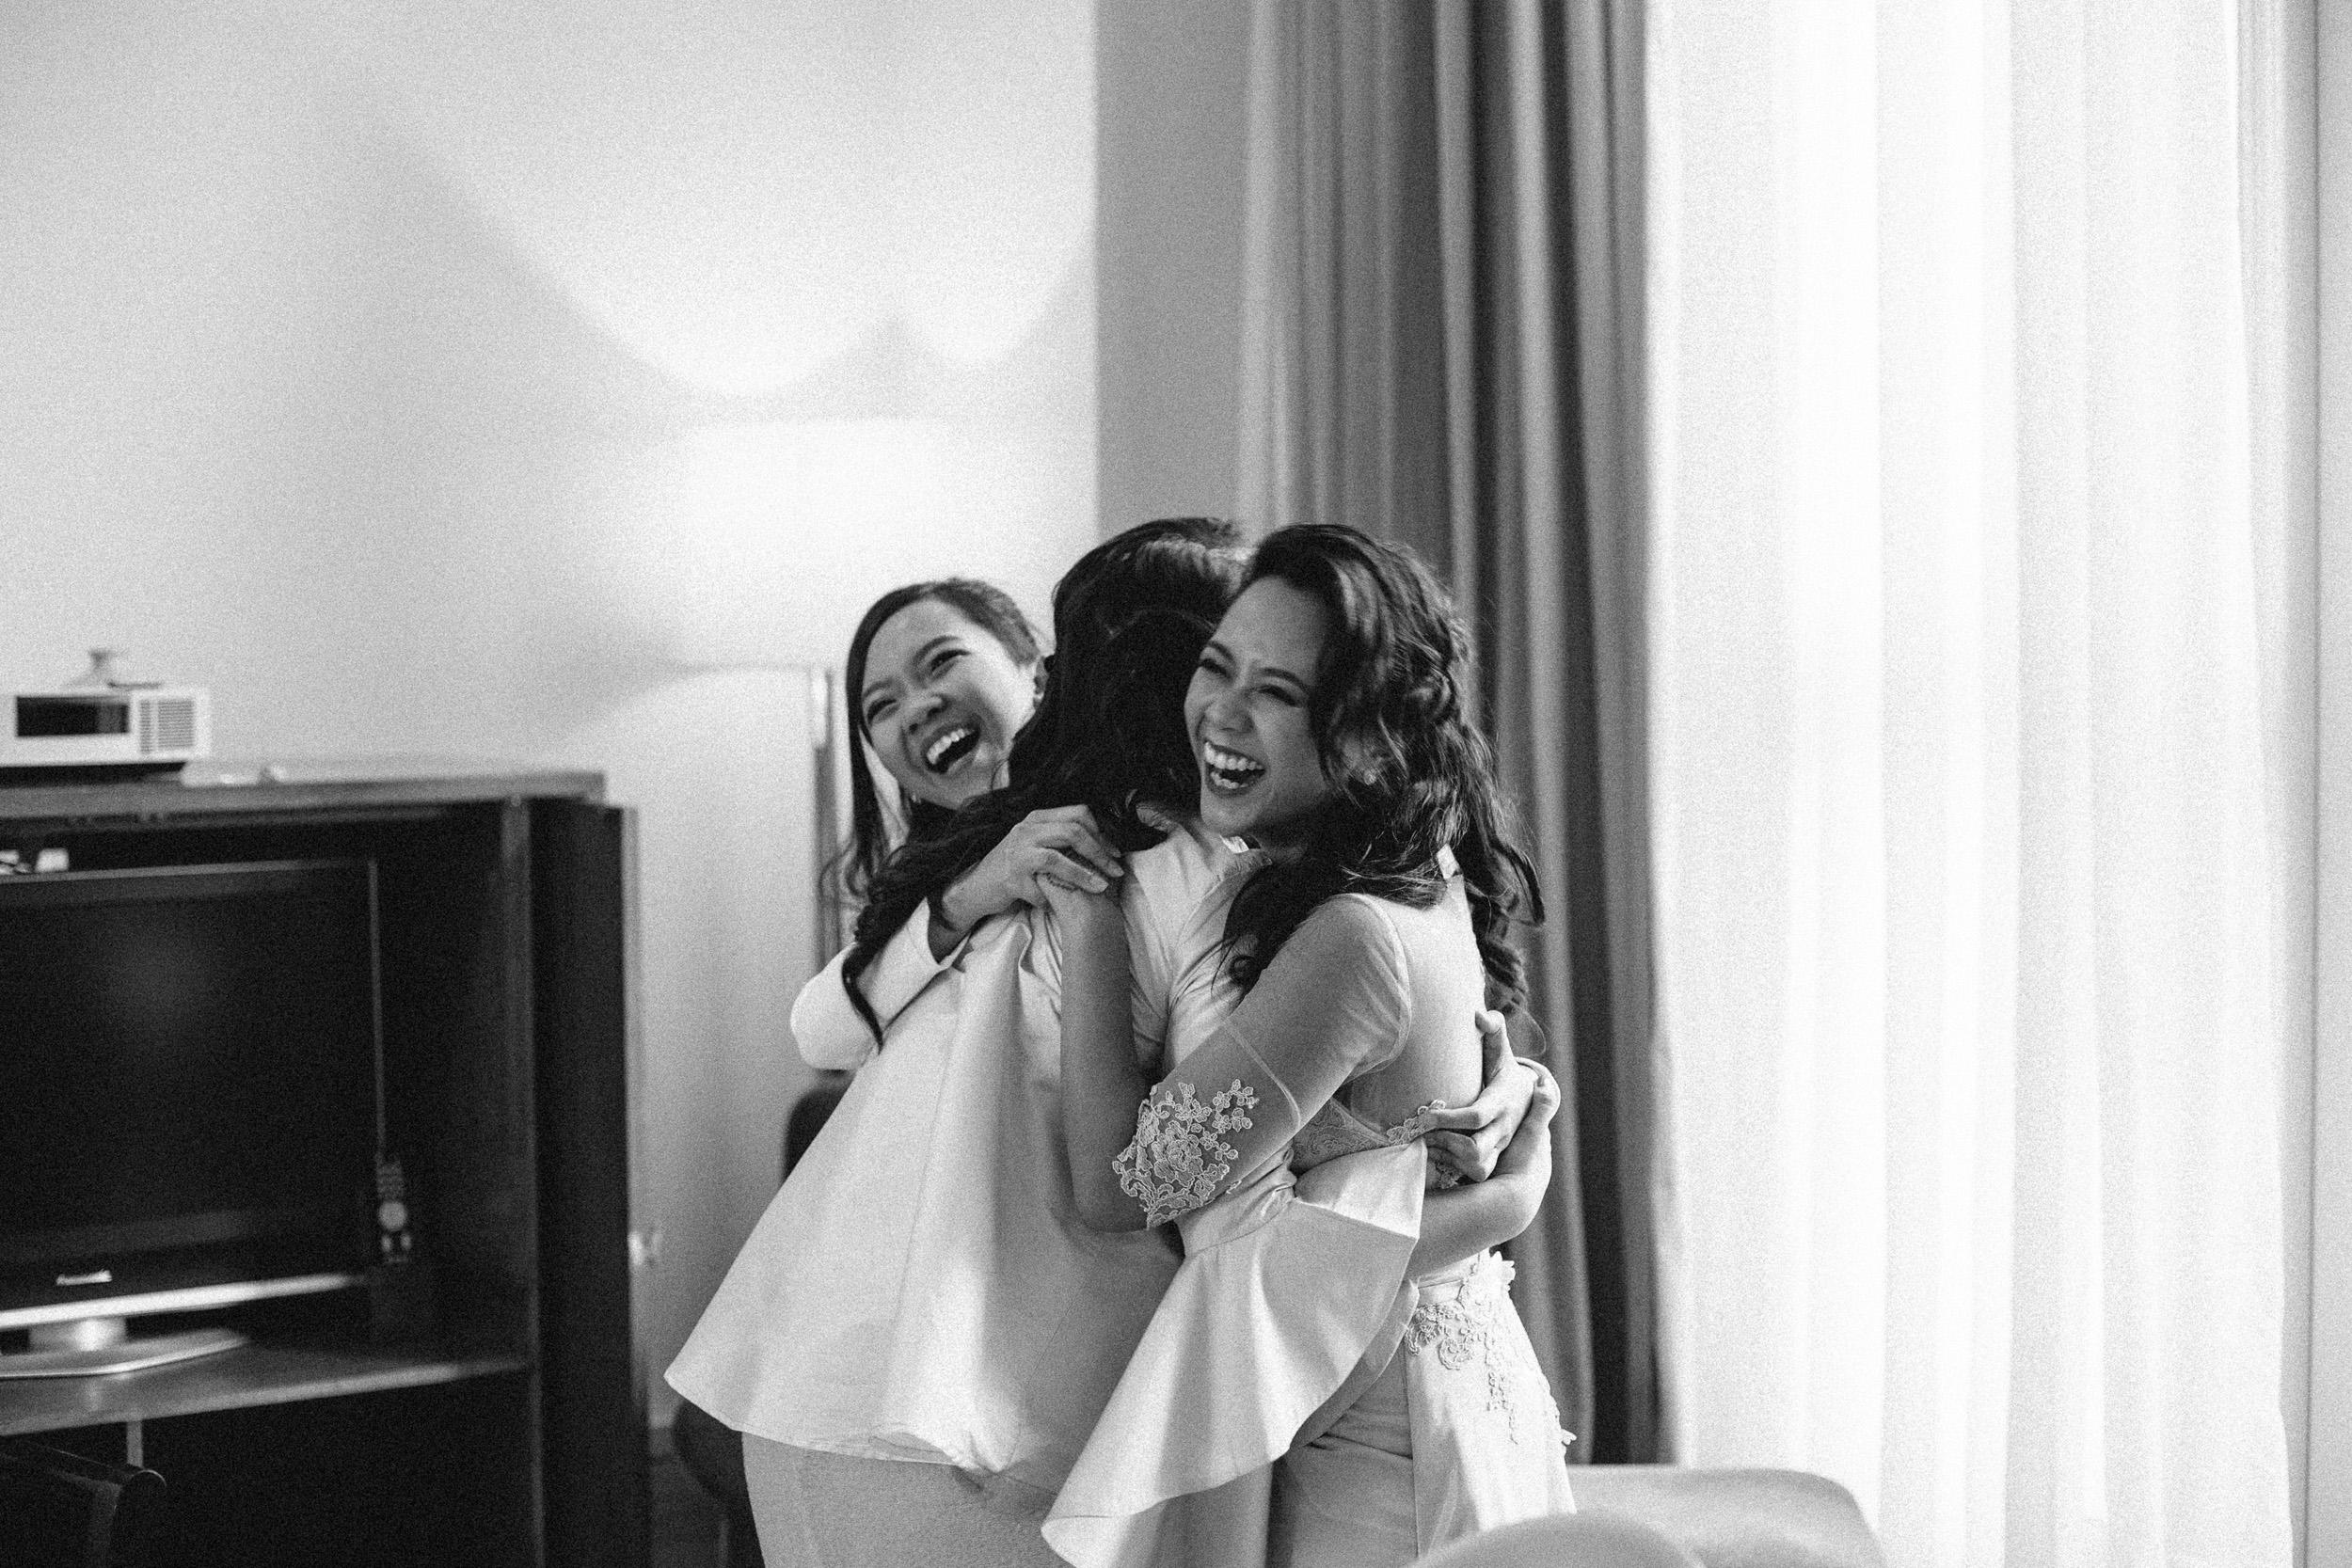 singapore-wedding-photographer-photography-wmt2017-044.jpg